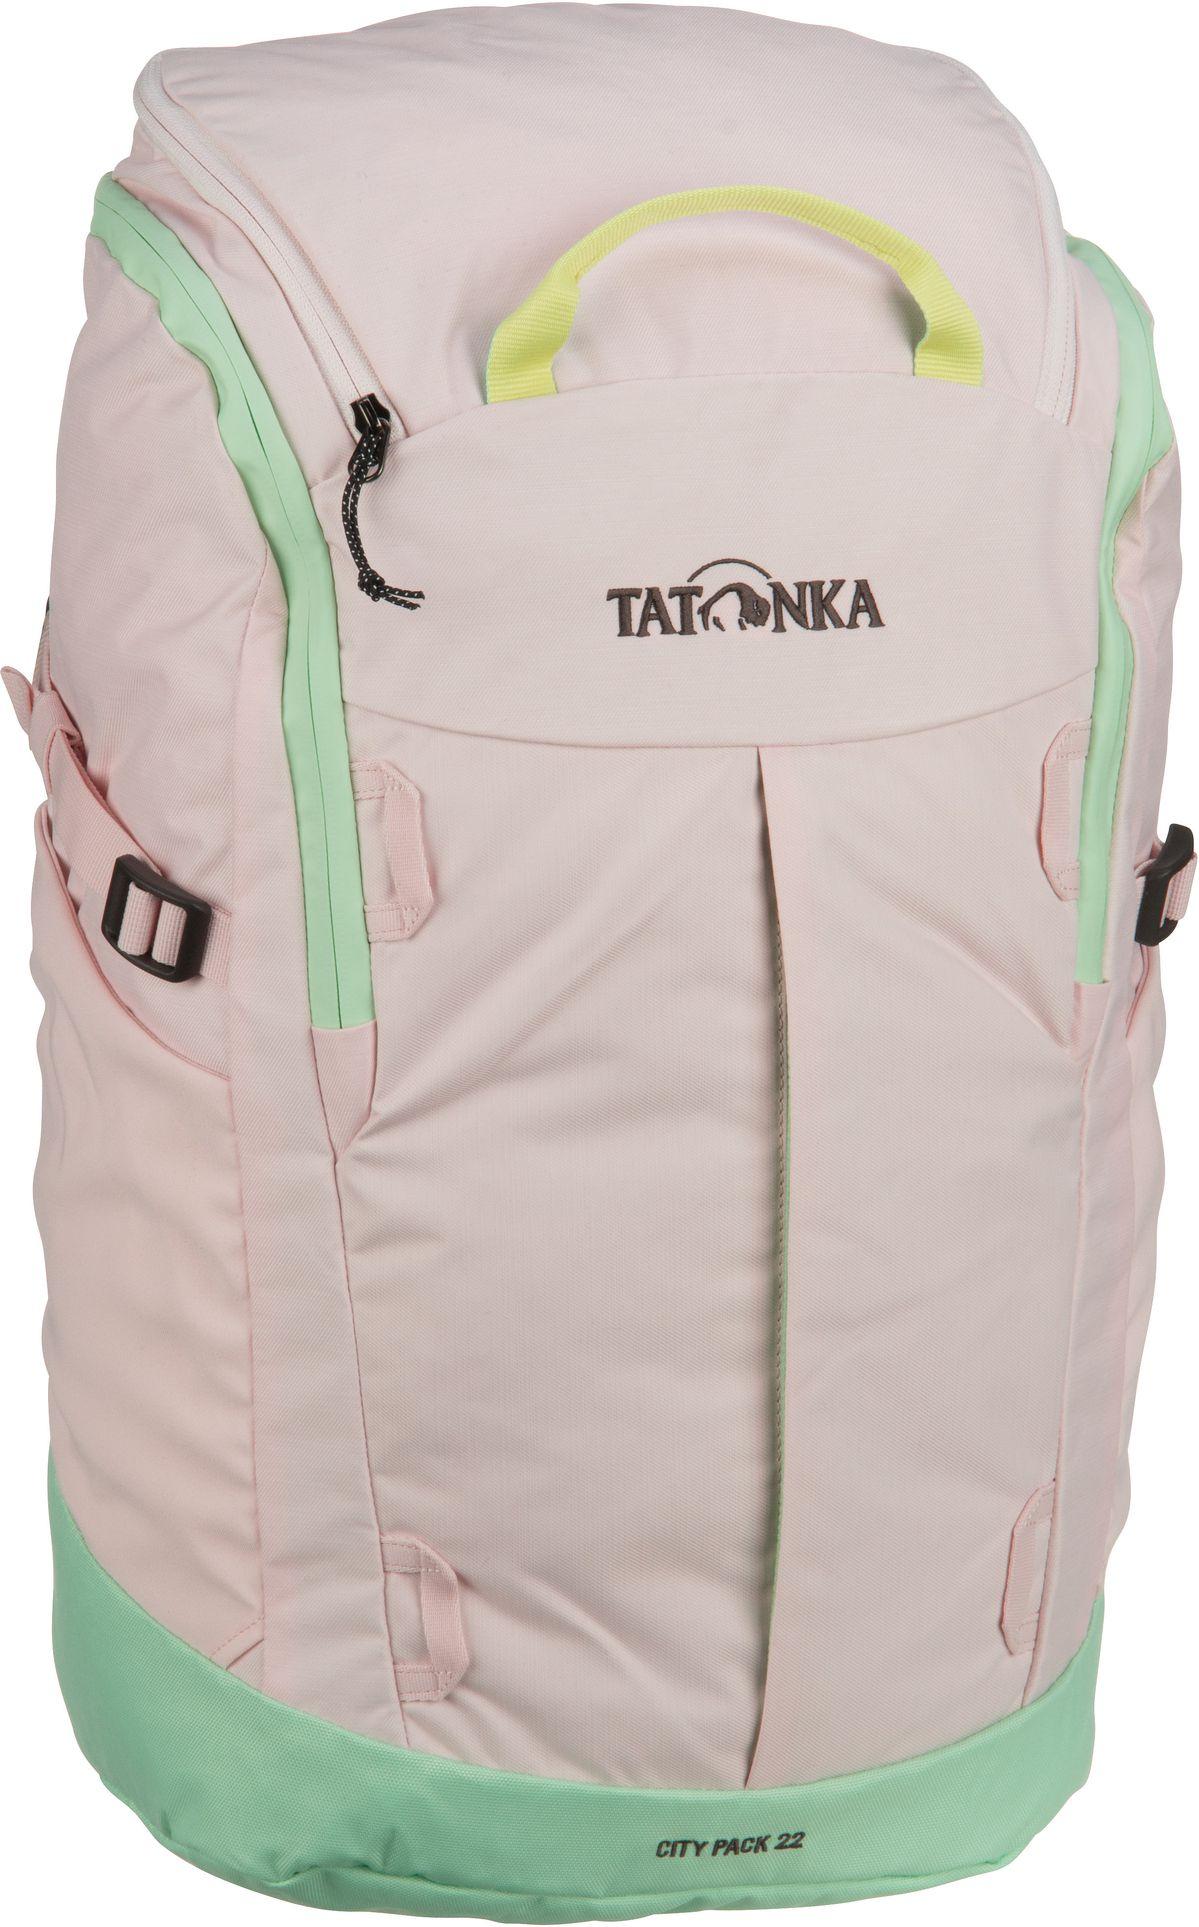 Rucksack / Daypack City Pack 22 Pink (22 Liter)